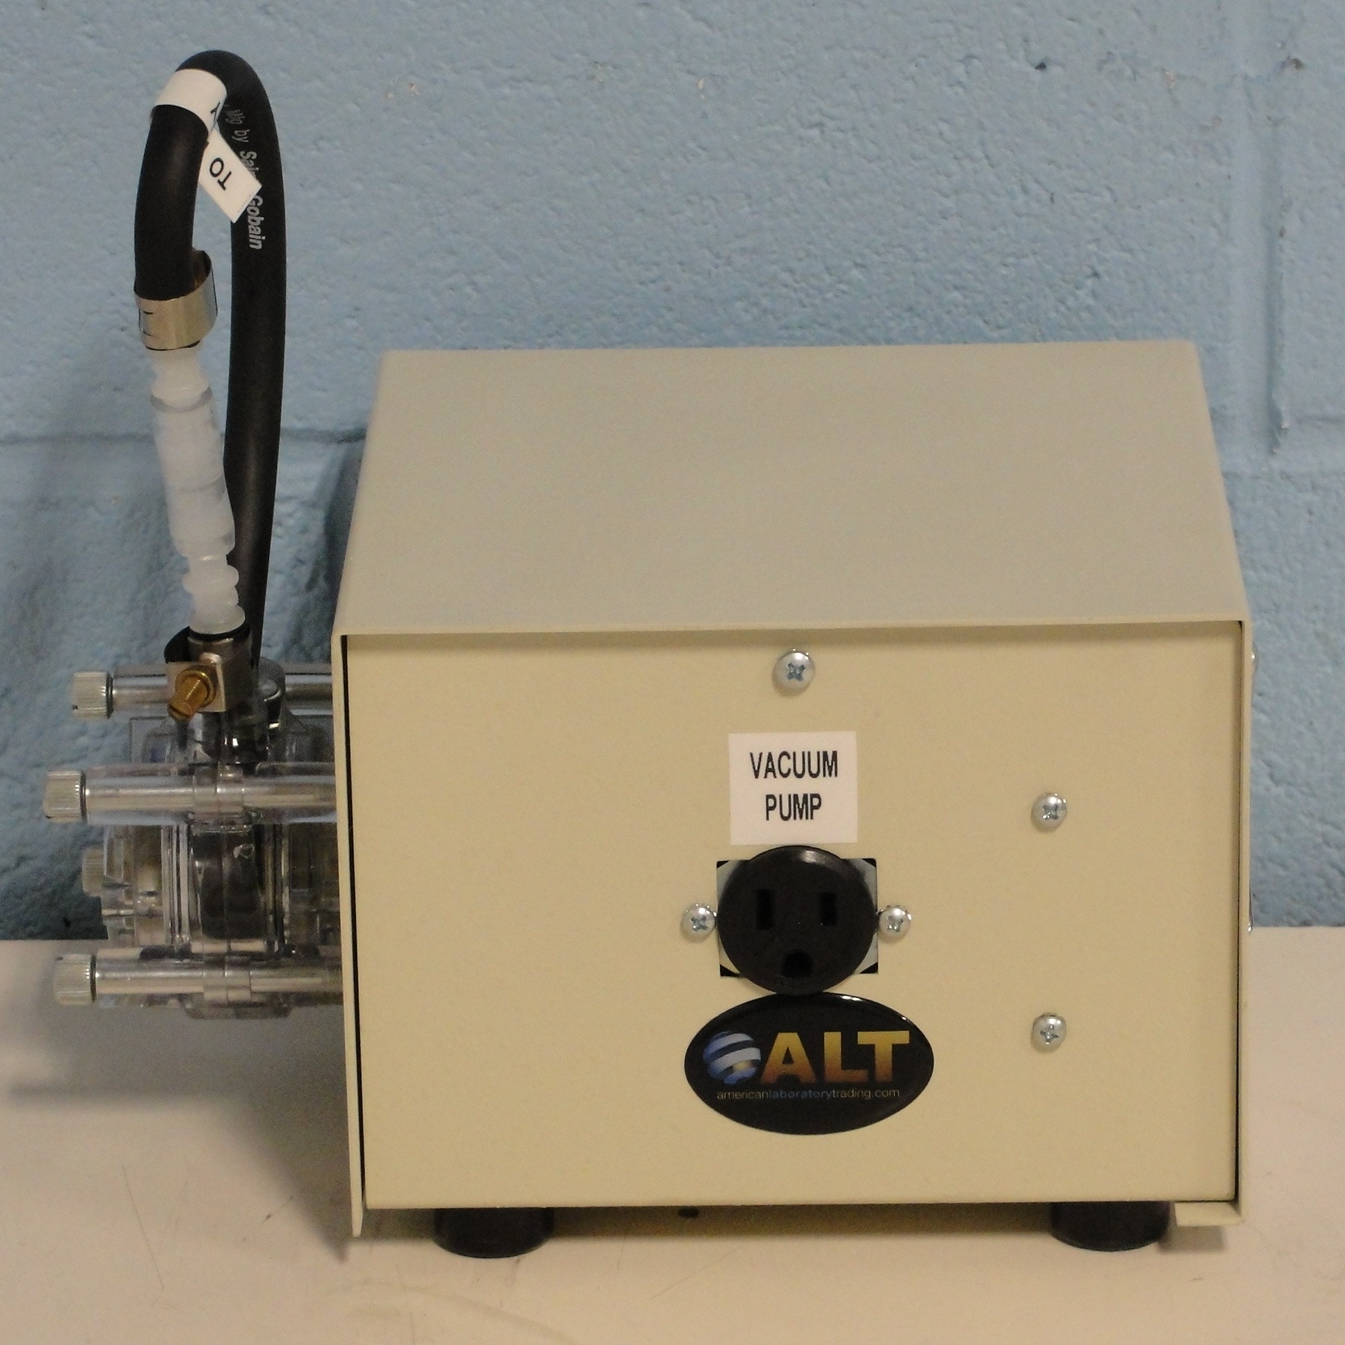 Cole-Parmer 52130 Pump with Masterflex Pump Head G18 Image